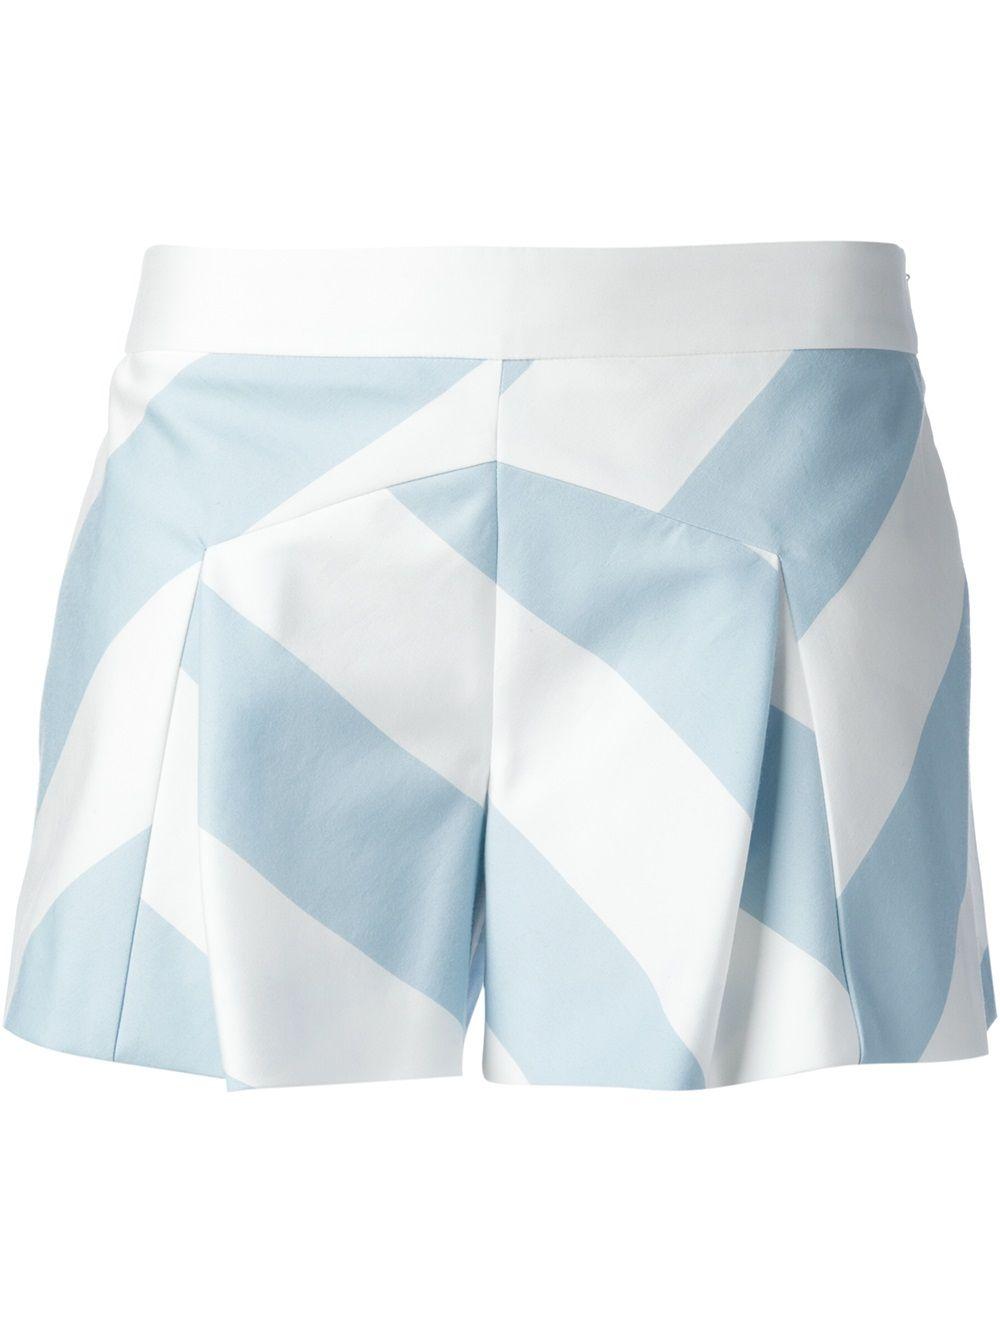 Shop MOSCHINO CHEAP & CHIC  colour block shorts from Farfetch